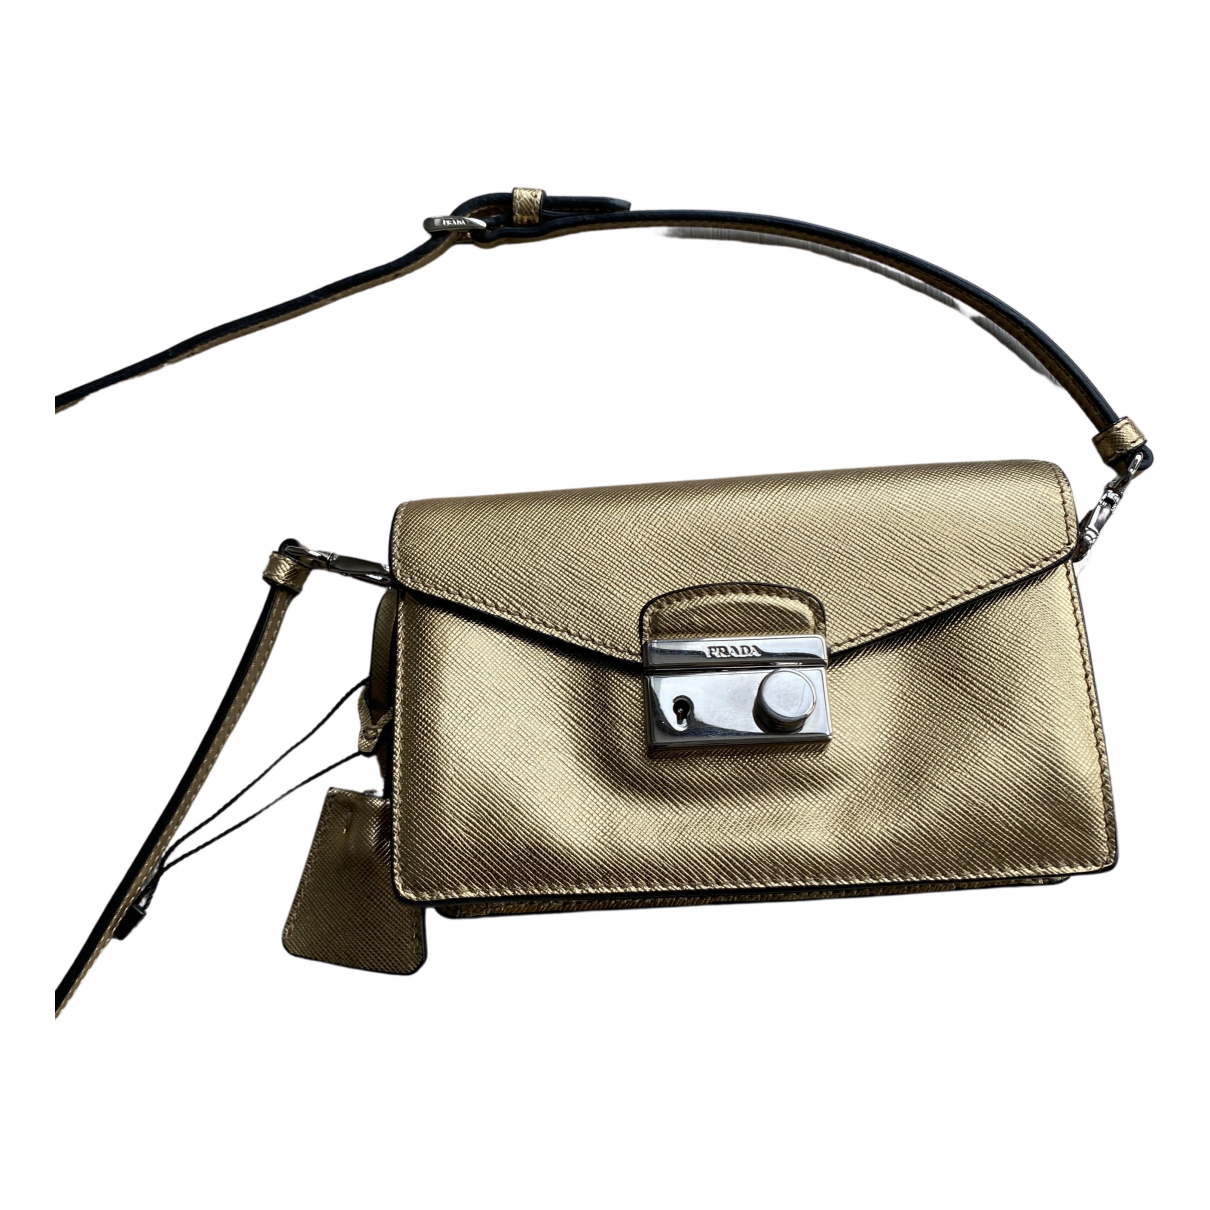 Prada saffiano  Gold Leather handbag for Women N